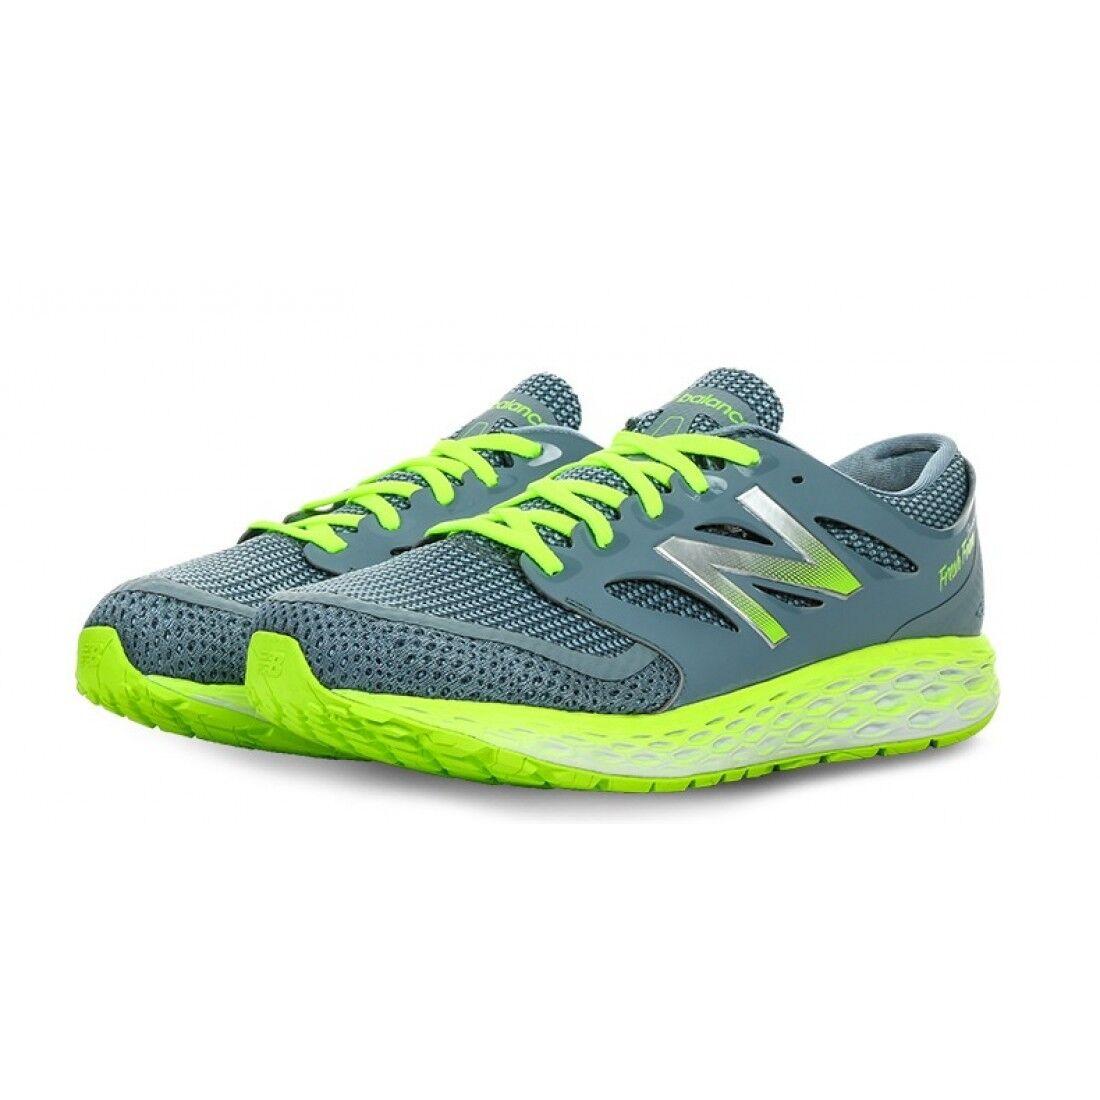 New Balance Fresh Foam Boracay 2  MBORAGG2 Running shoes Grey Green Mens size 7